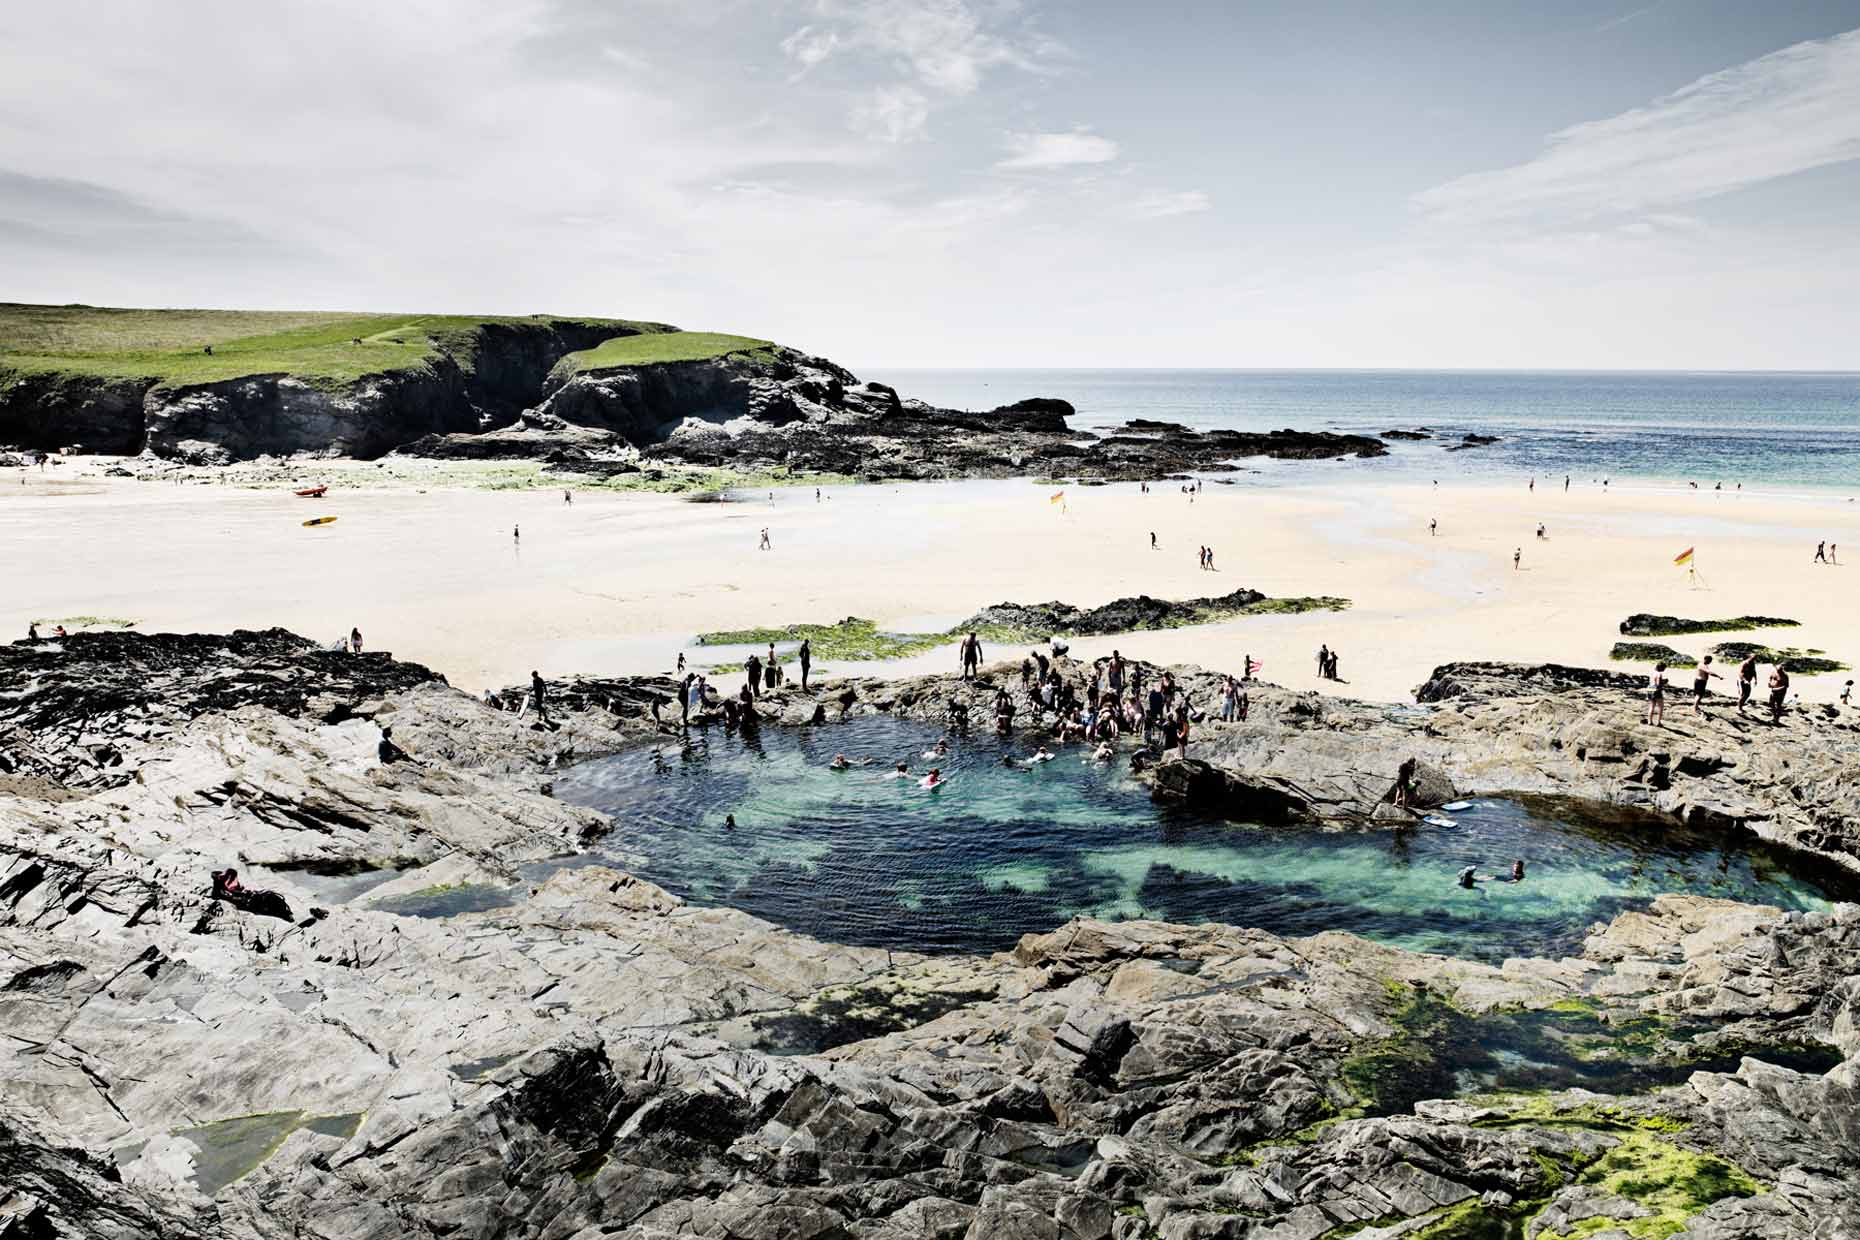 tidal-pools-england-pim-vuik-fotografie-film-rotterdam-04.jpg